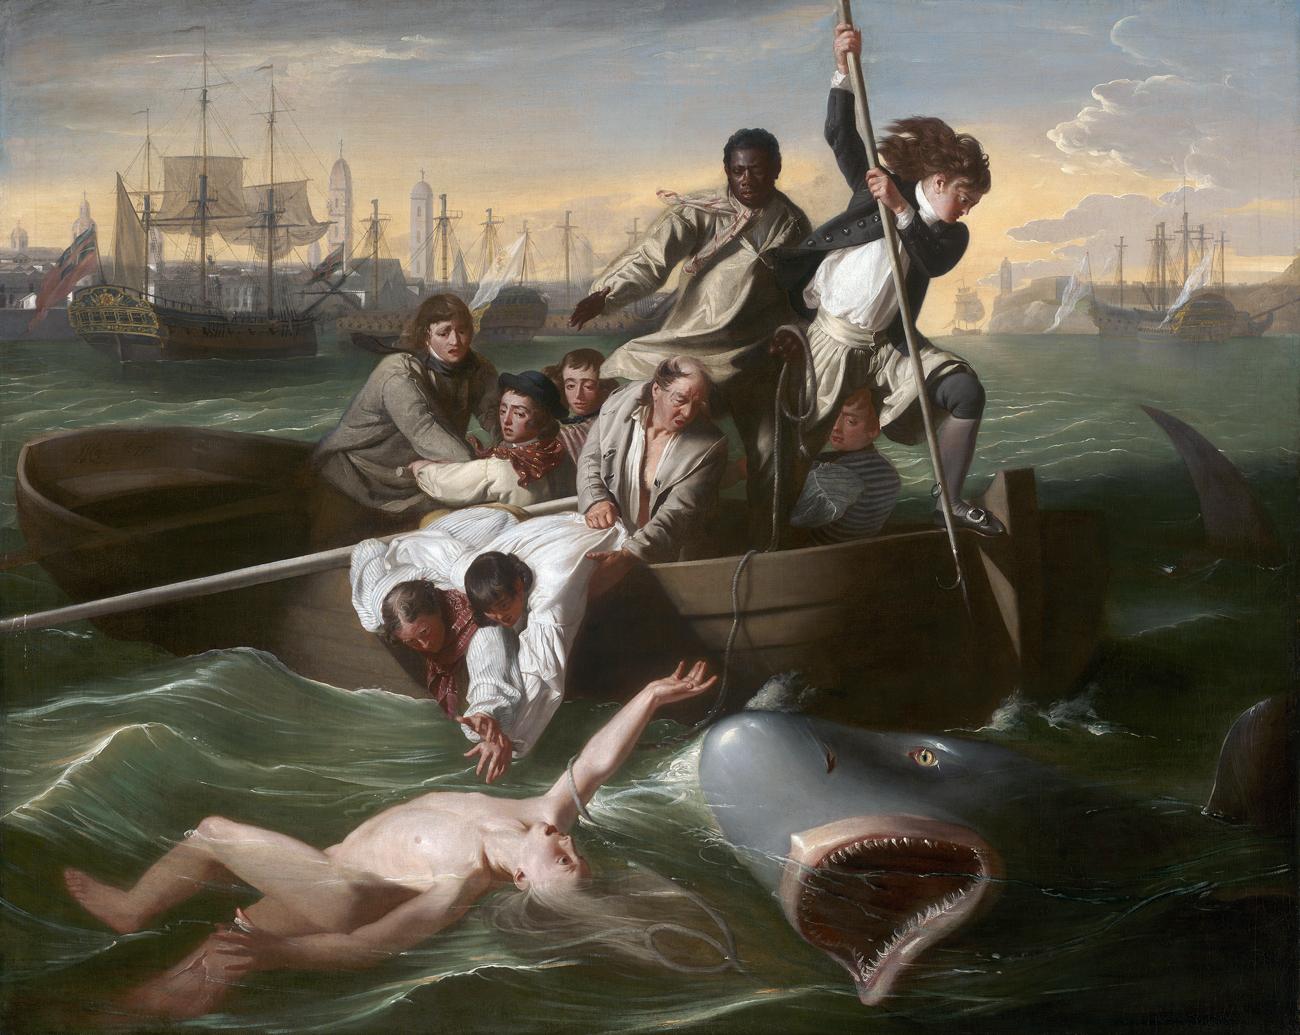 Watson and the Shark, by John Singleton Copley, 1778.